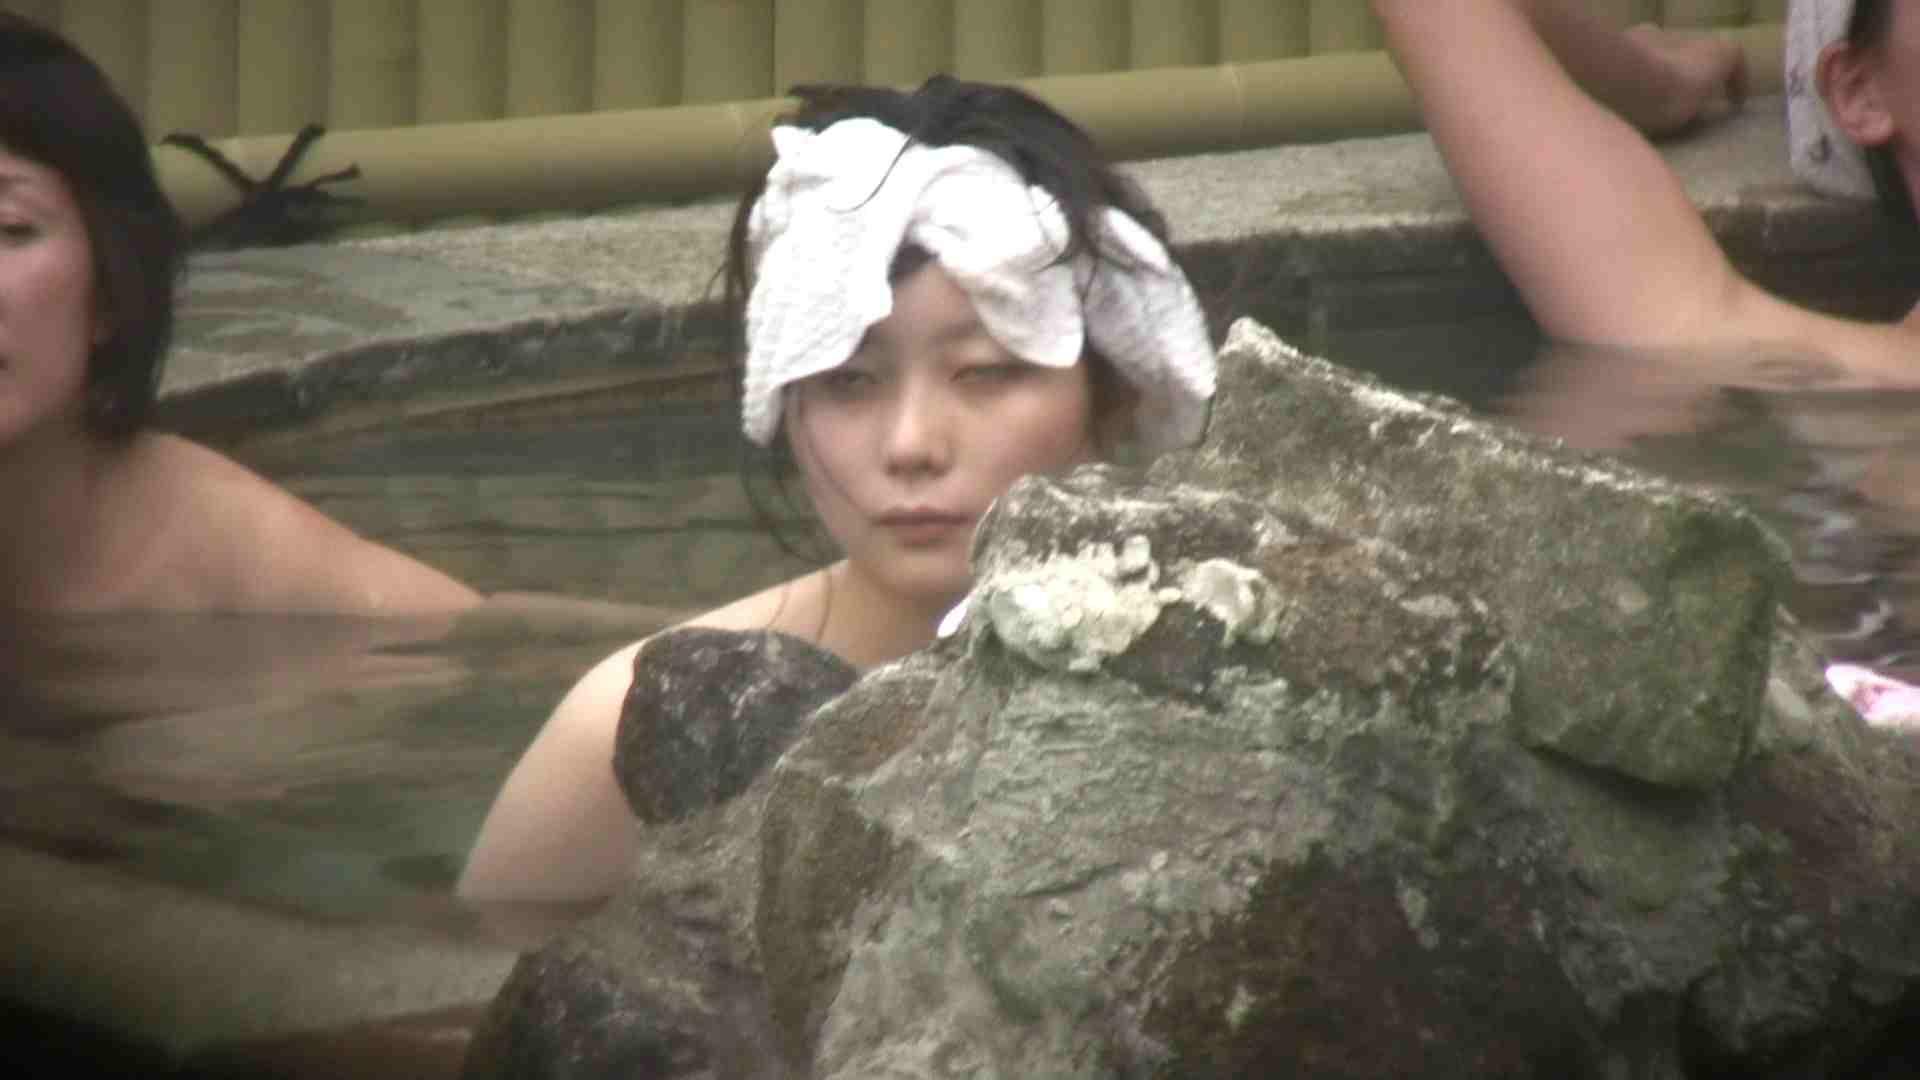 Aquaな露天風呂Vol.147 盗撮シリーズ | 露天風呂編  80PIX 1